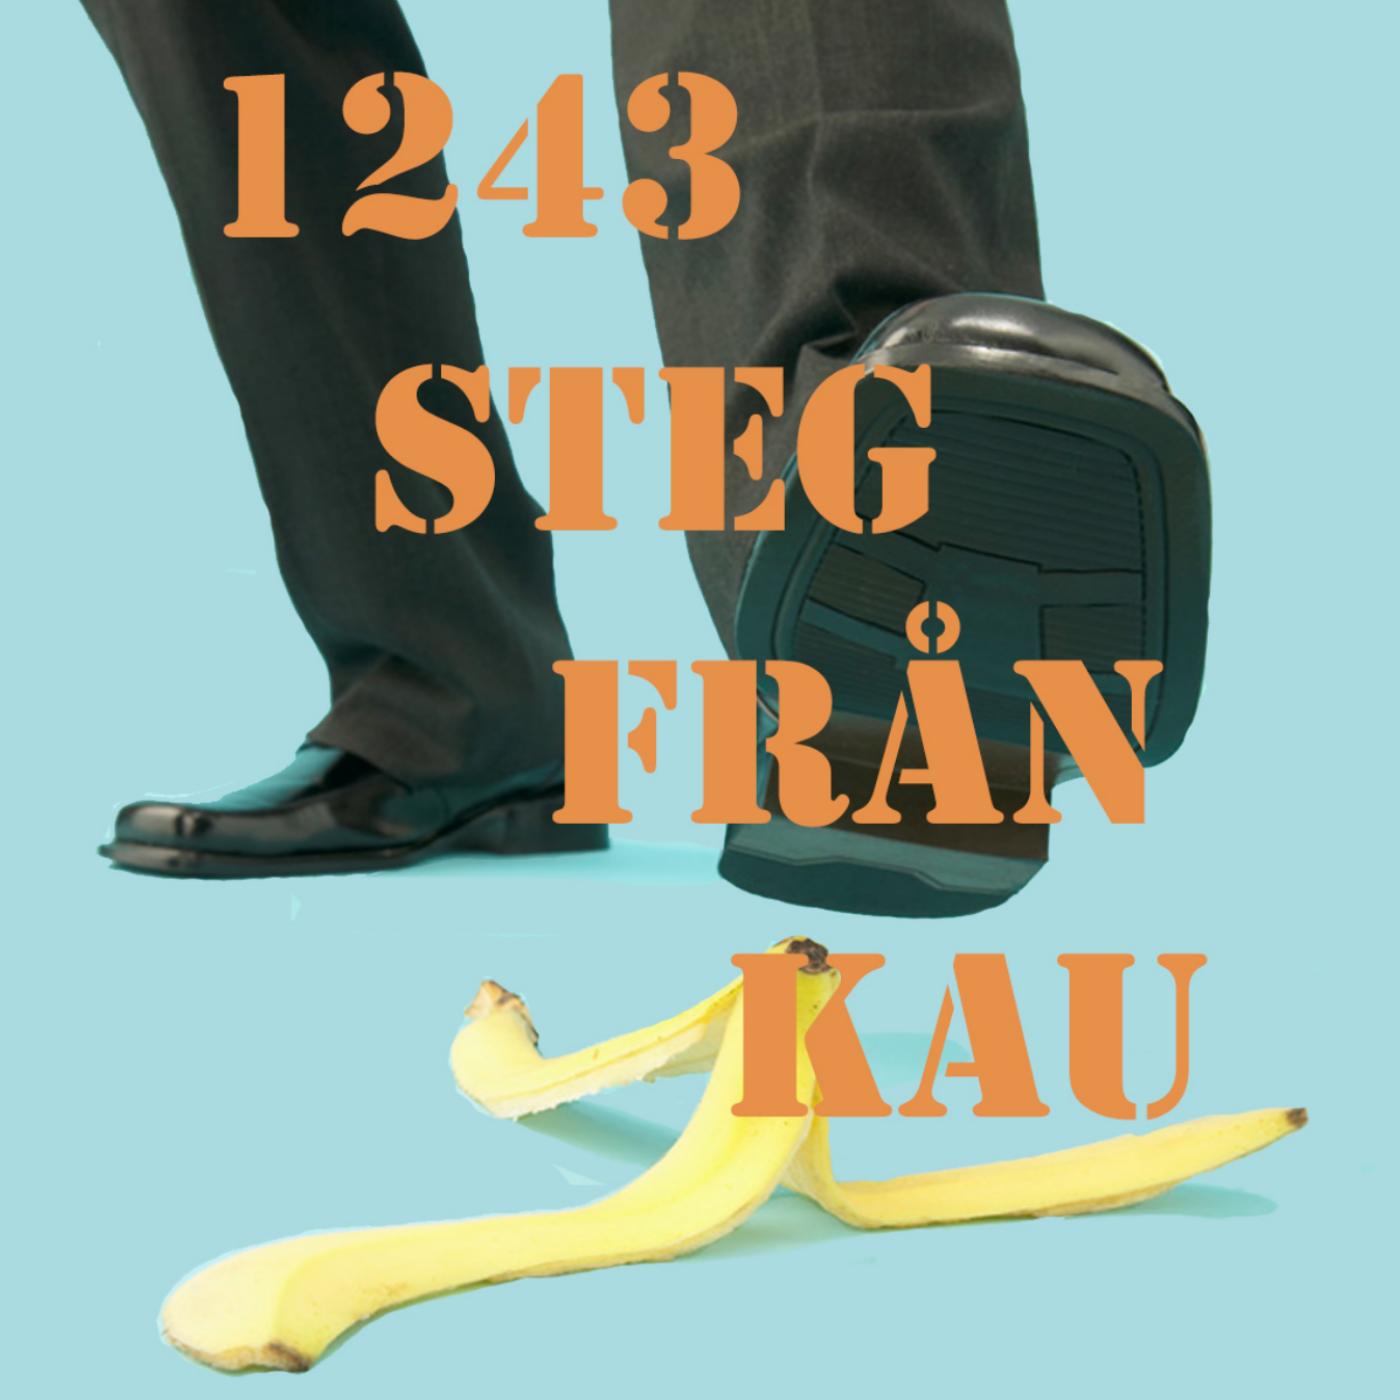 1243 Steg Från Kau